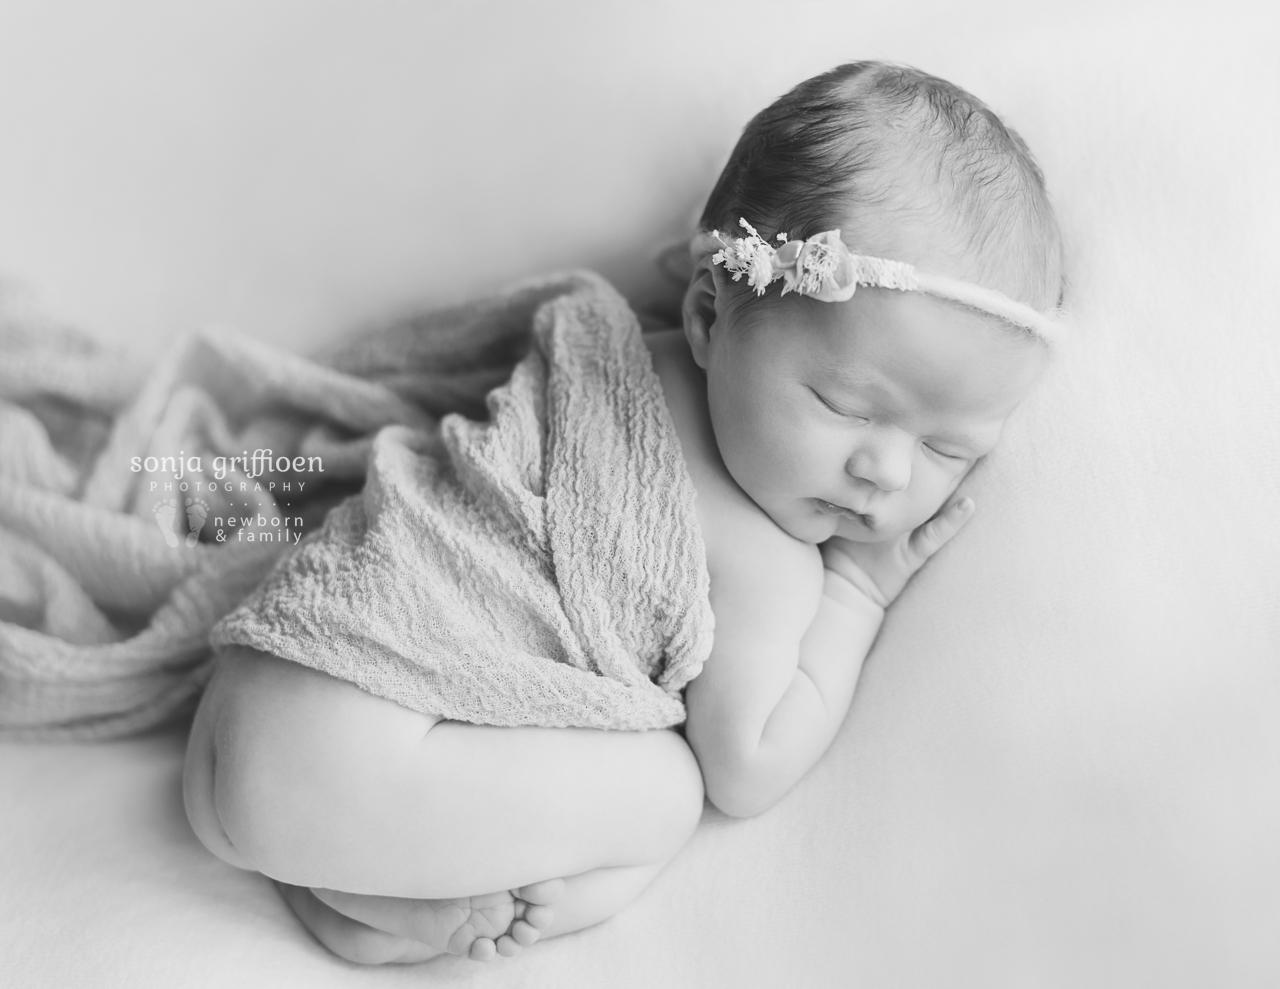 Asher-Newborn-Brisbane-Newborn-Photographer-Sonja-Griffioen-07bw.jpg